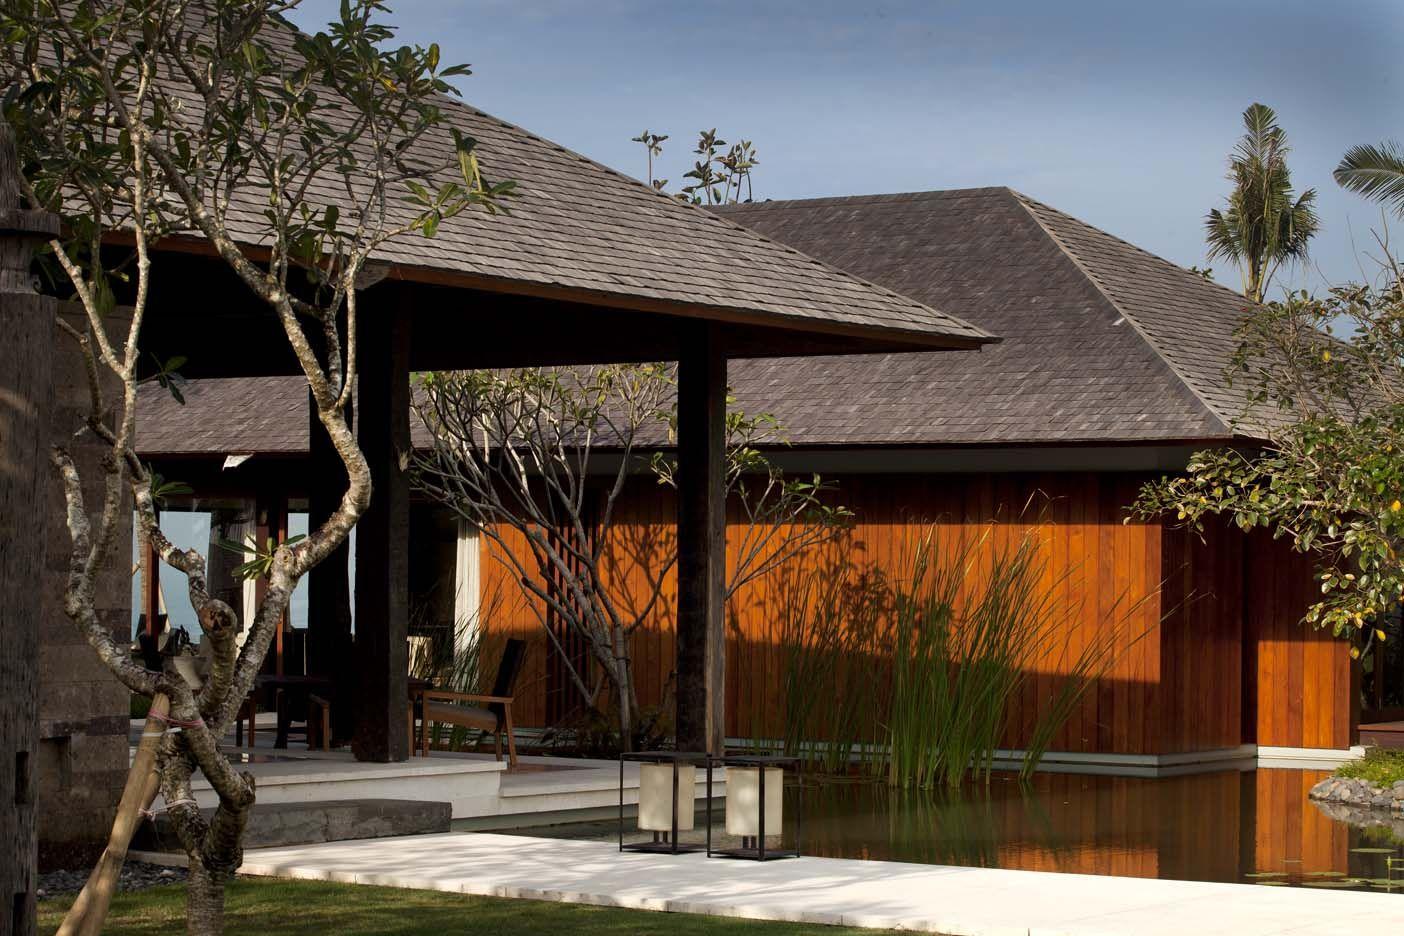 The bali villas bali architecture tropical architecture balinese villa ubud hotels suburban